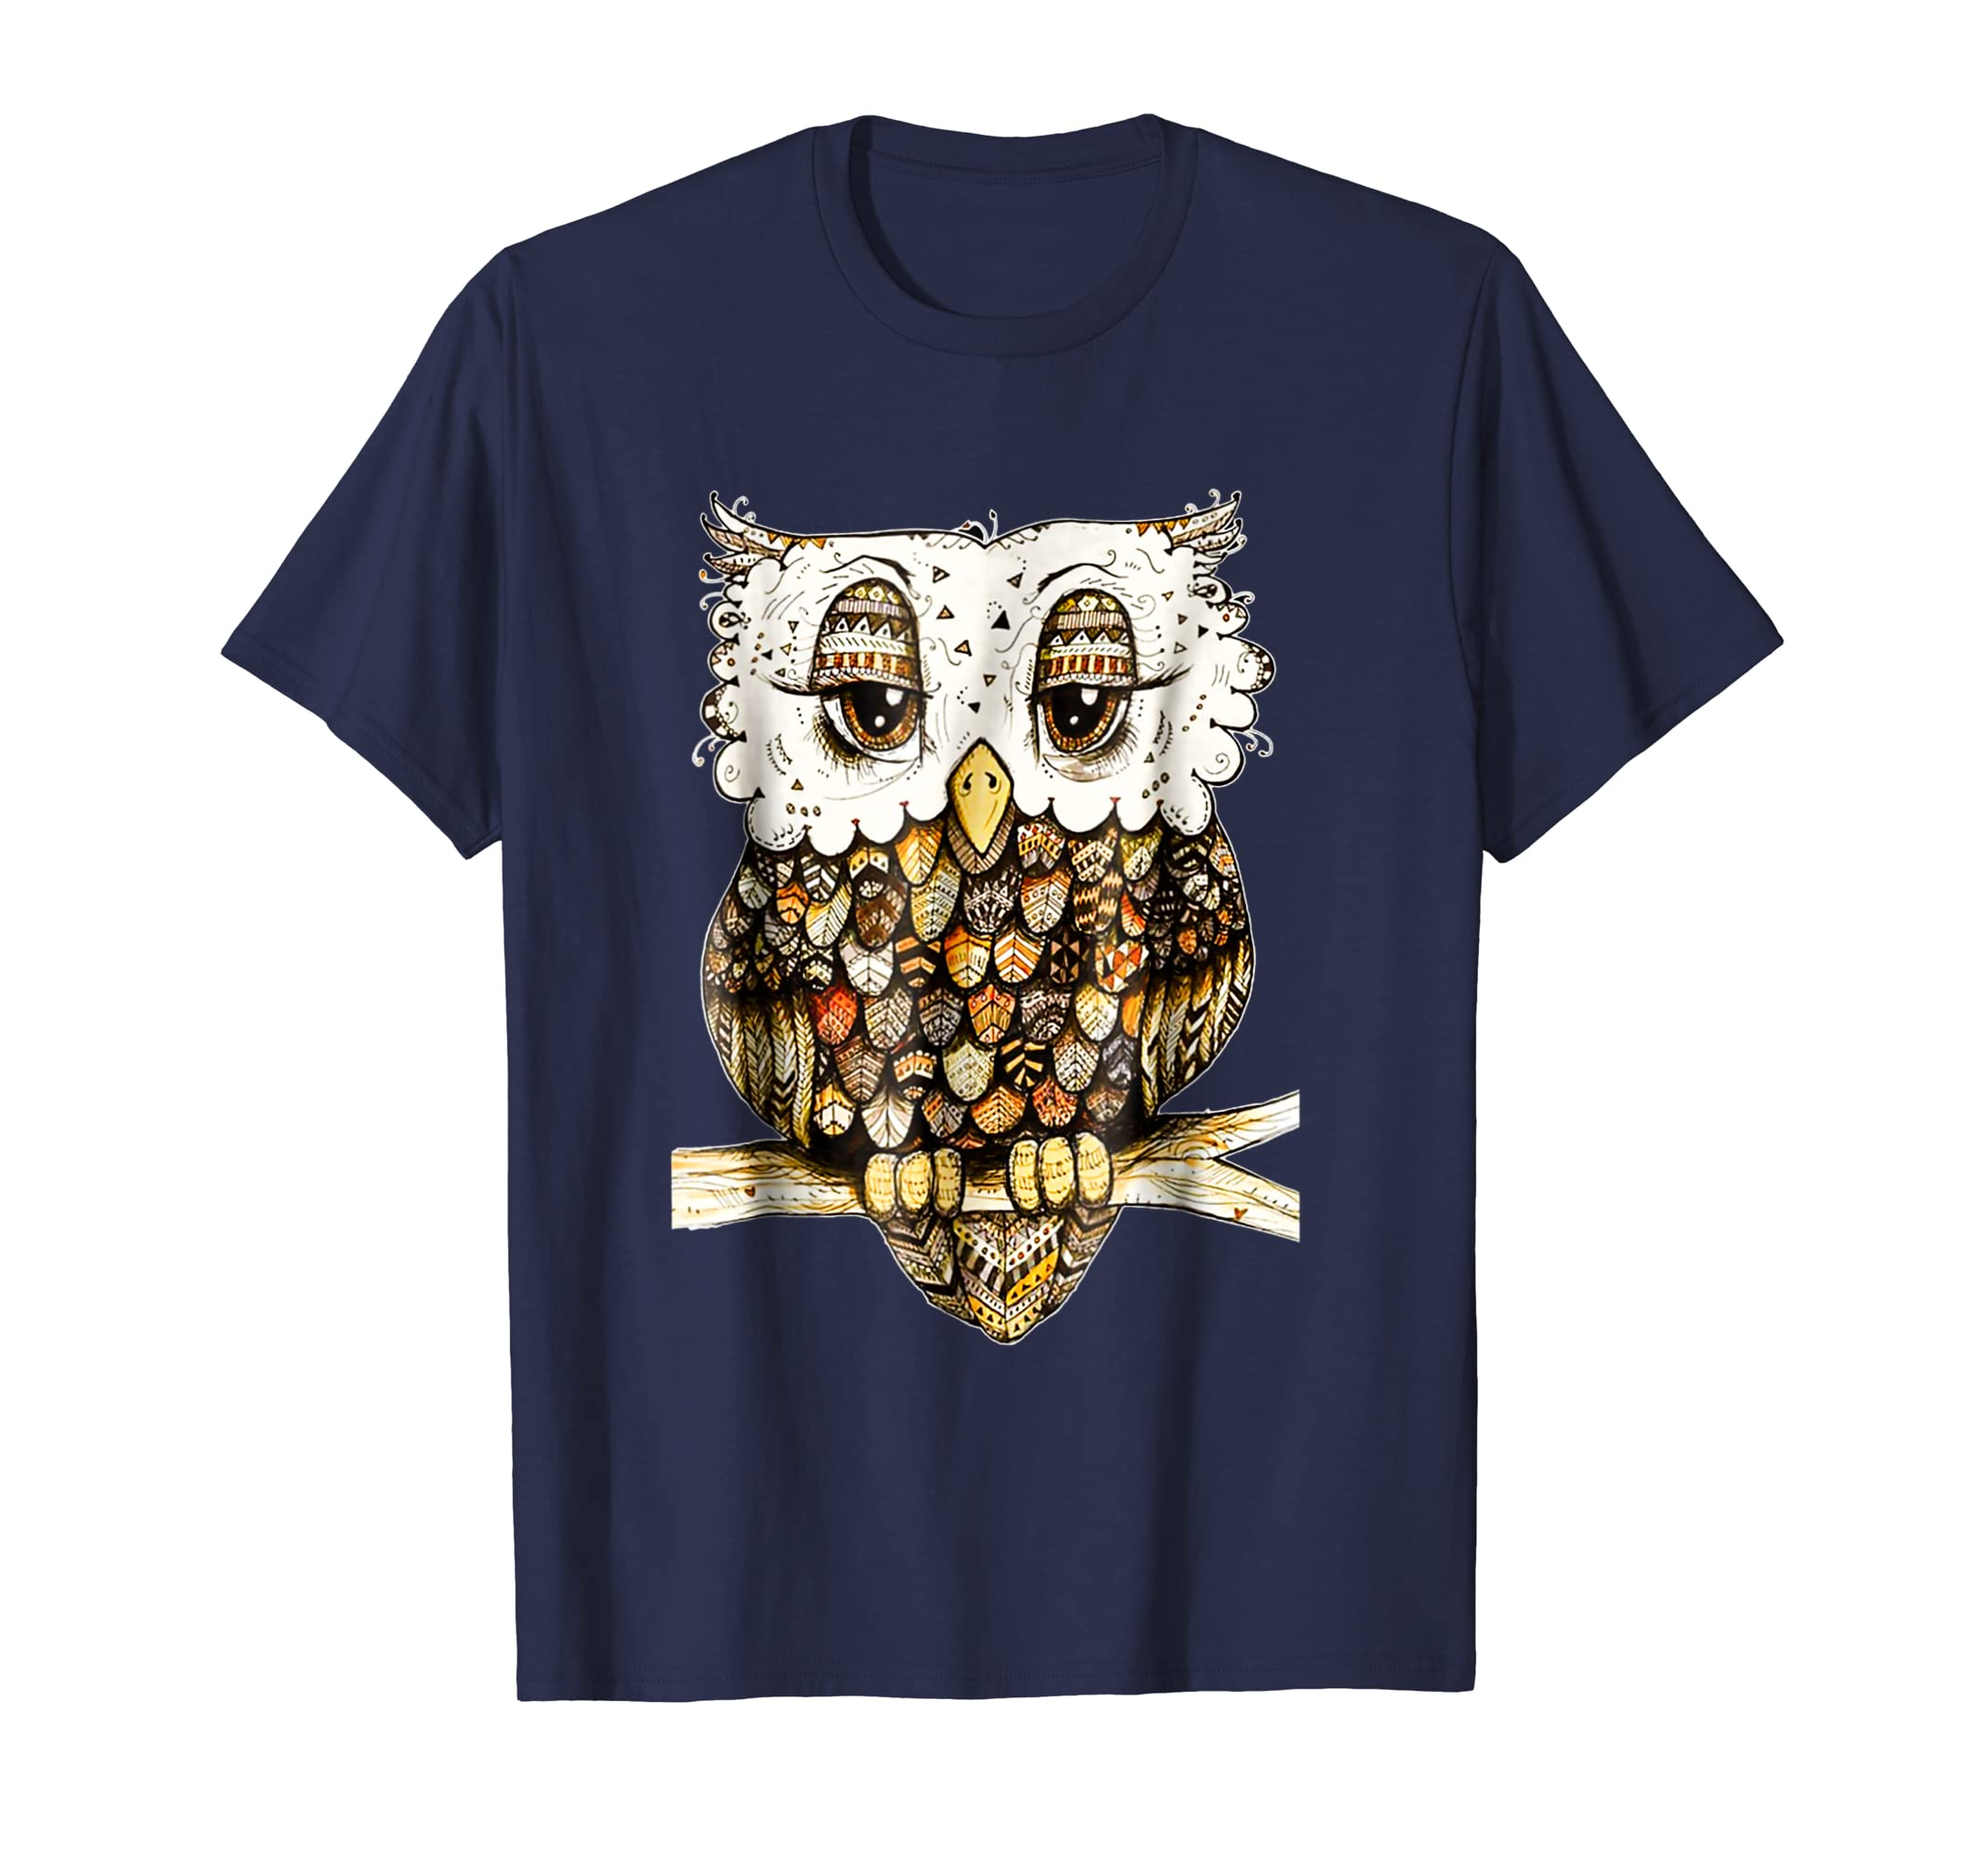 Owl Brocade T-shirt Gift For Women Girls-AZP